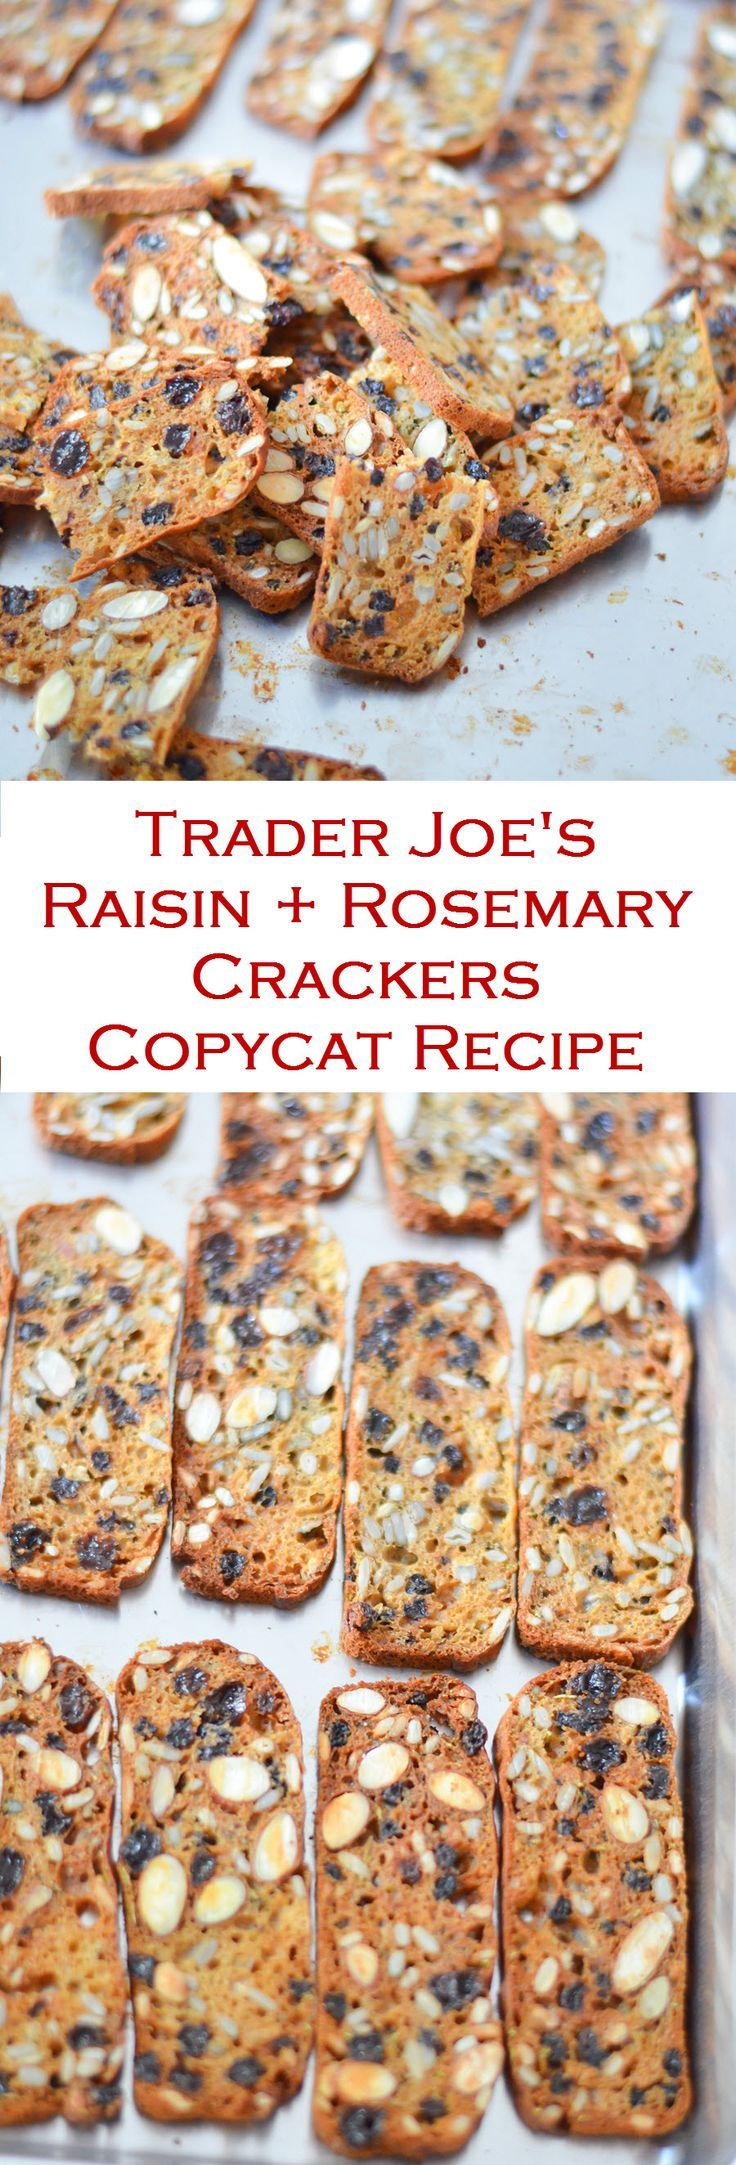 Easy, homemade recipe for Trader Joe's Raisin + Rosemary Crackers. Make this Copycat version today!